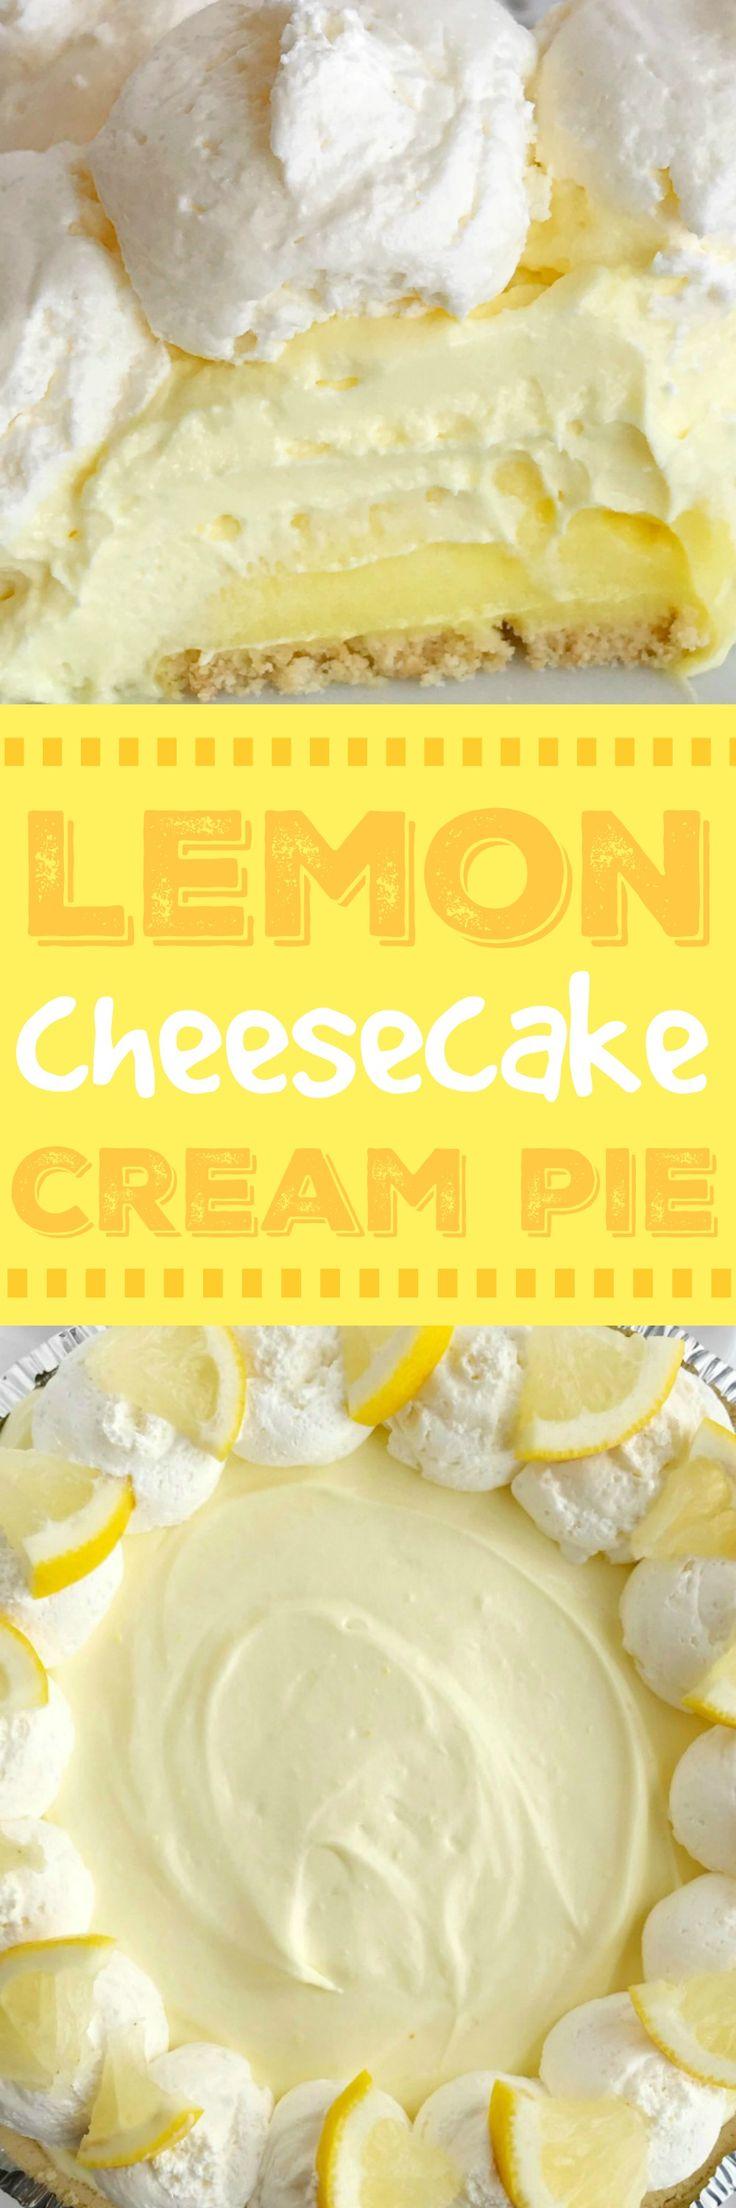 No Bake Lemon Cheesecake Cream Pie   Lemon Desserts   No Bake Pie Recipe   No Bake Desserts   Lemon   Citrus Recipe #nobakerecipes #dessertrecipes #pie #creampie